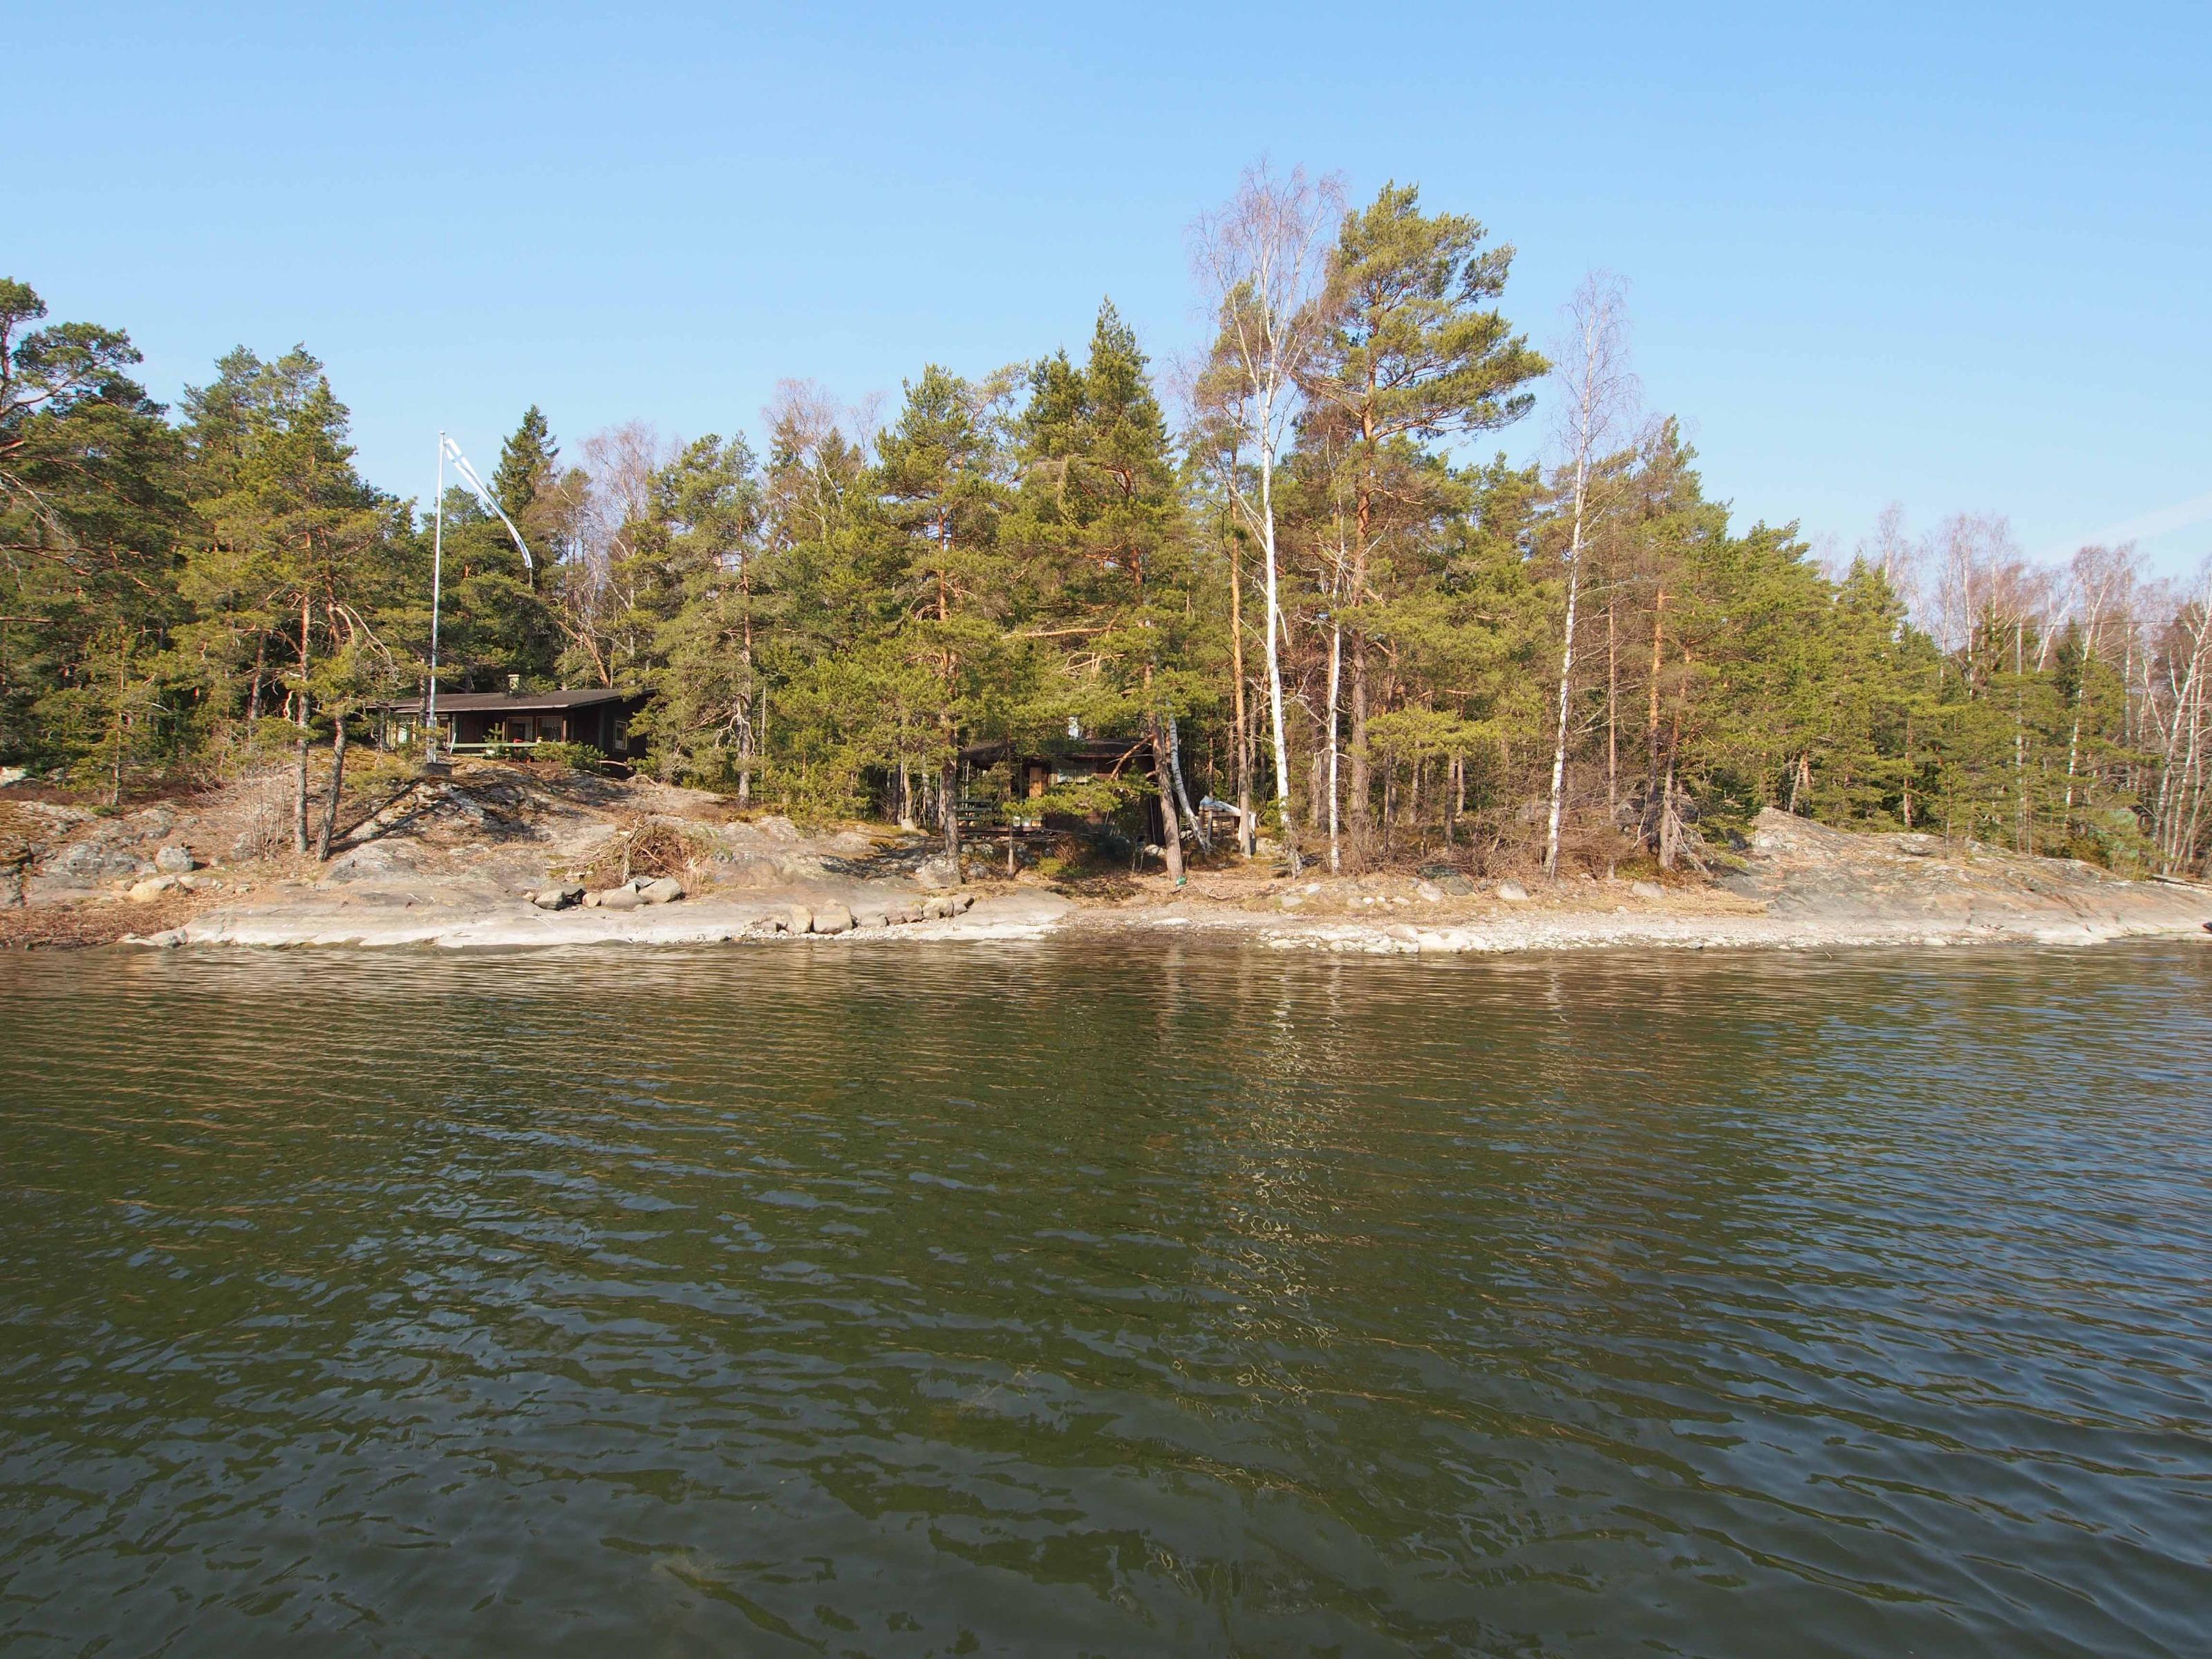 Porvoo, Pellinki, Hummelholmen Lagunen